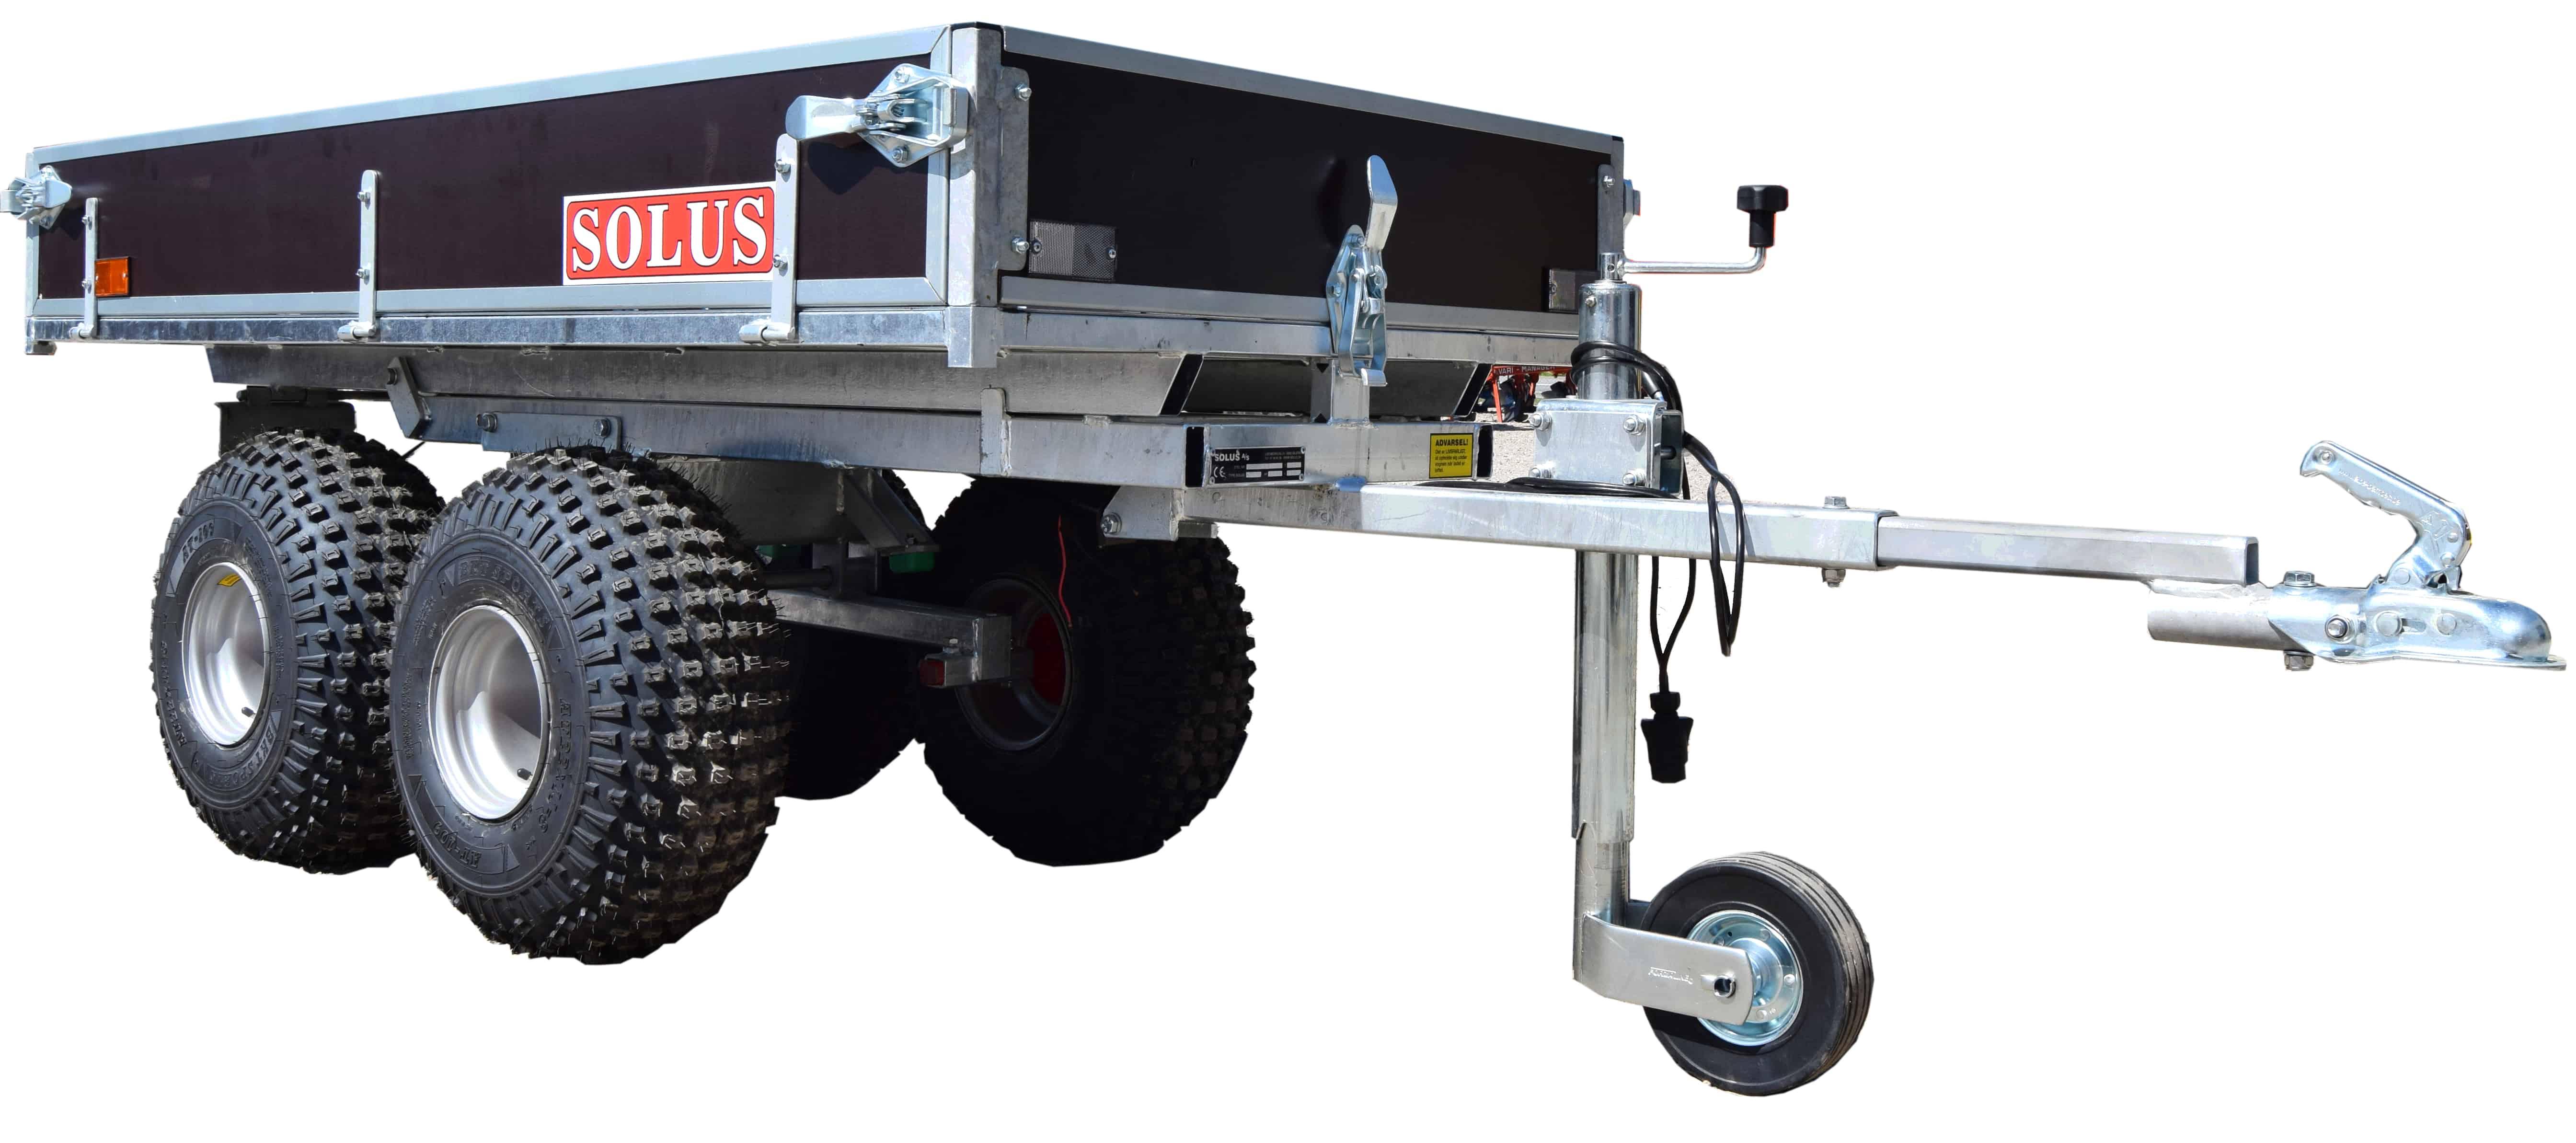 Kraftig og stabil ATV vogn som følger dig over alt